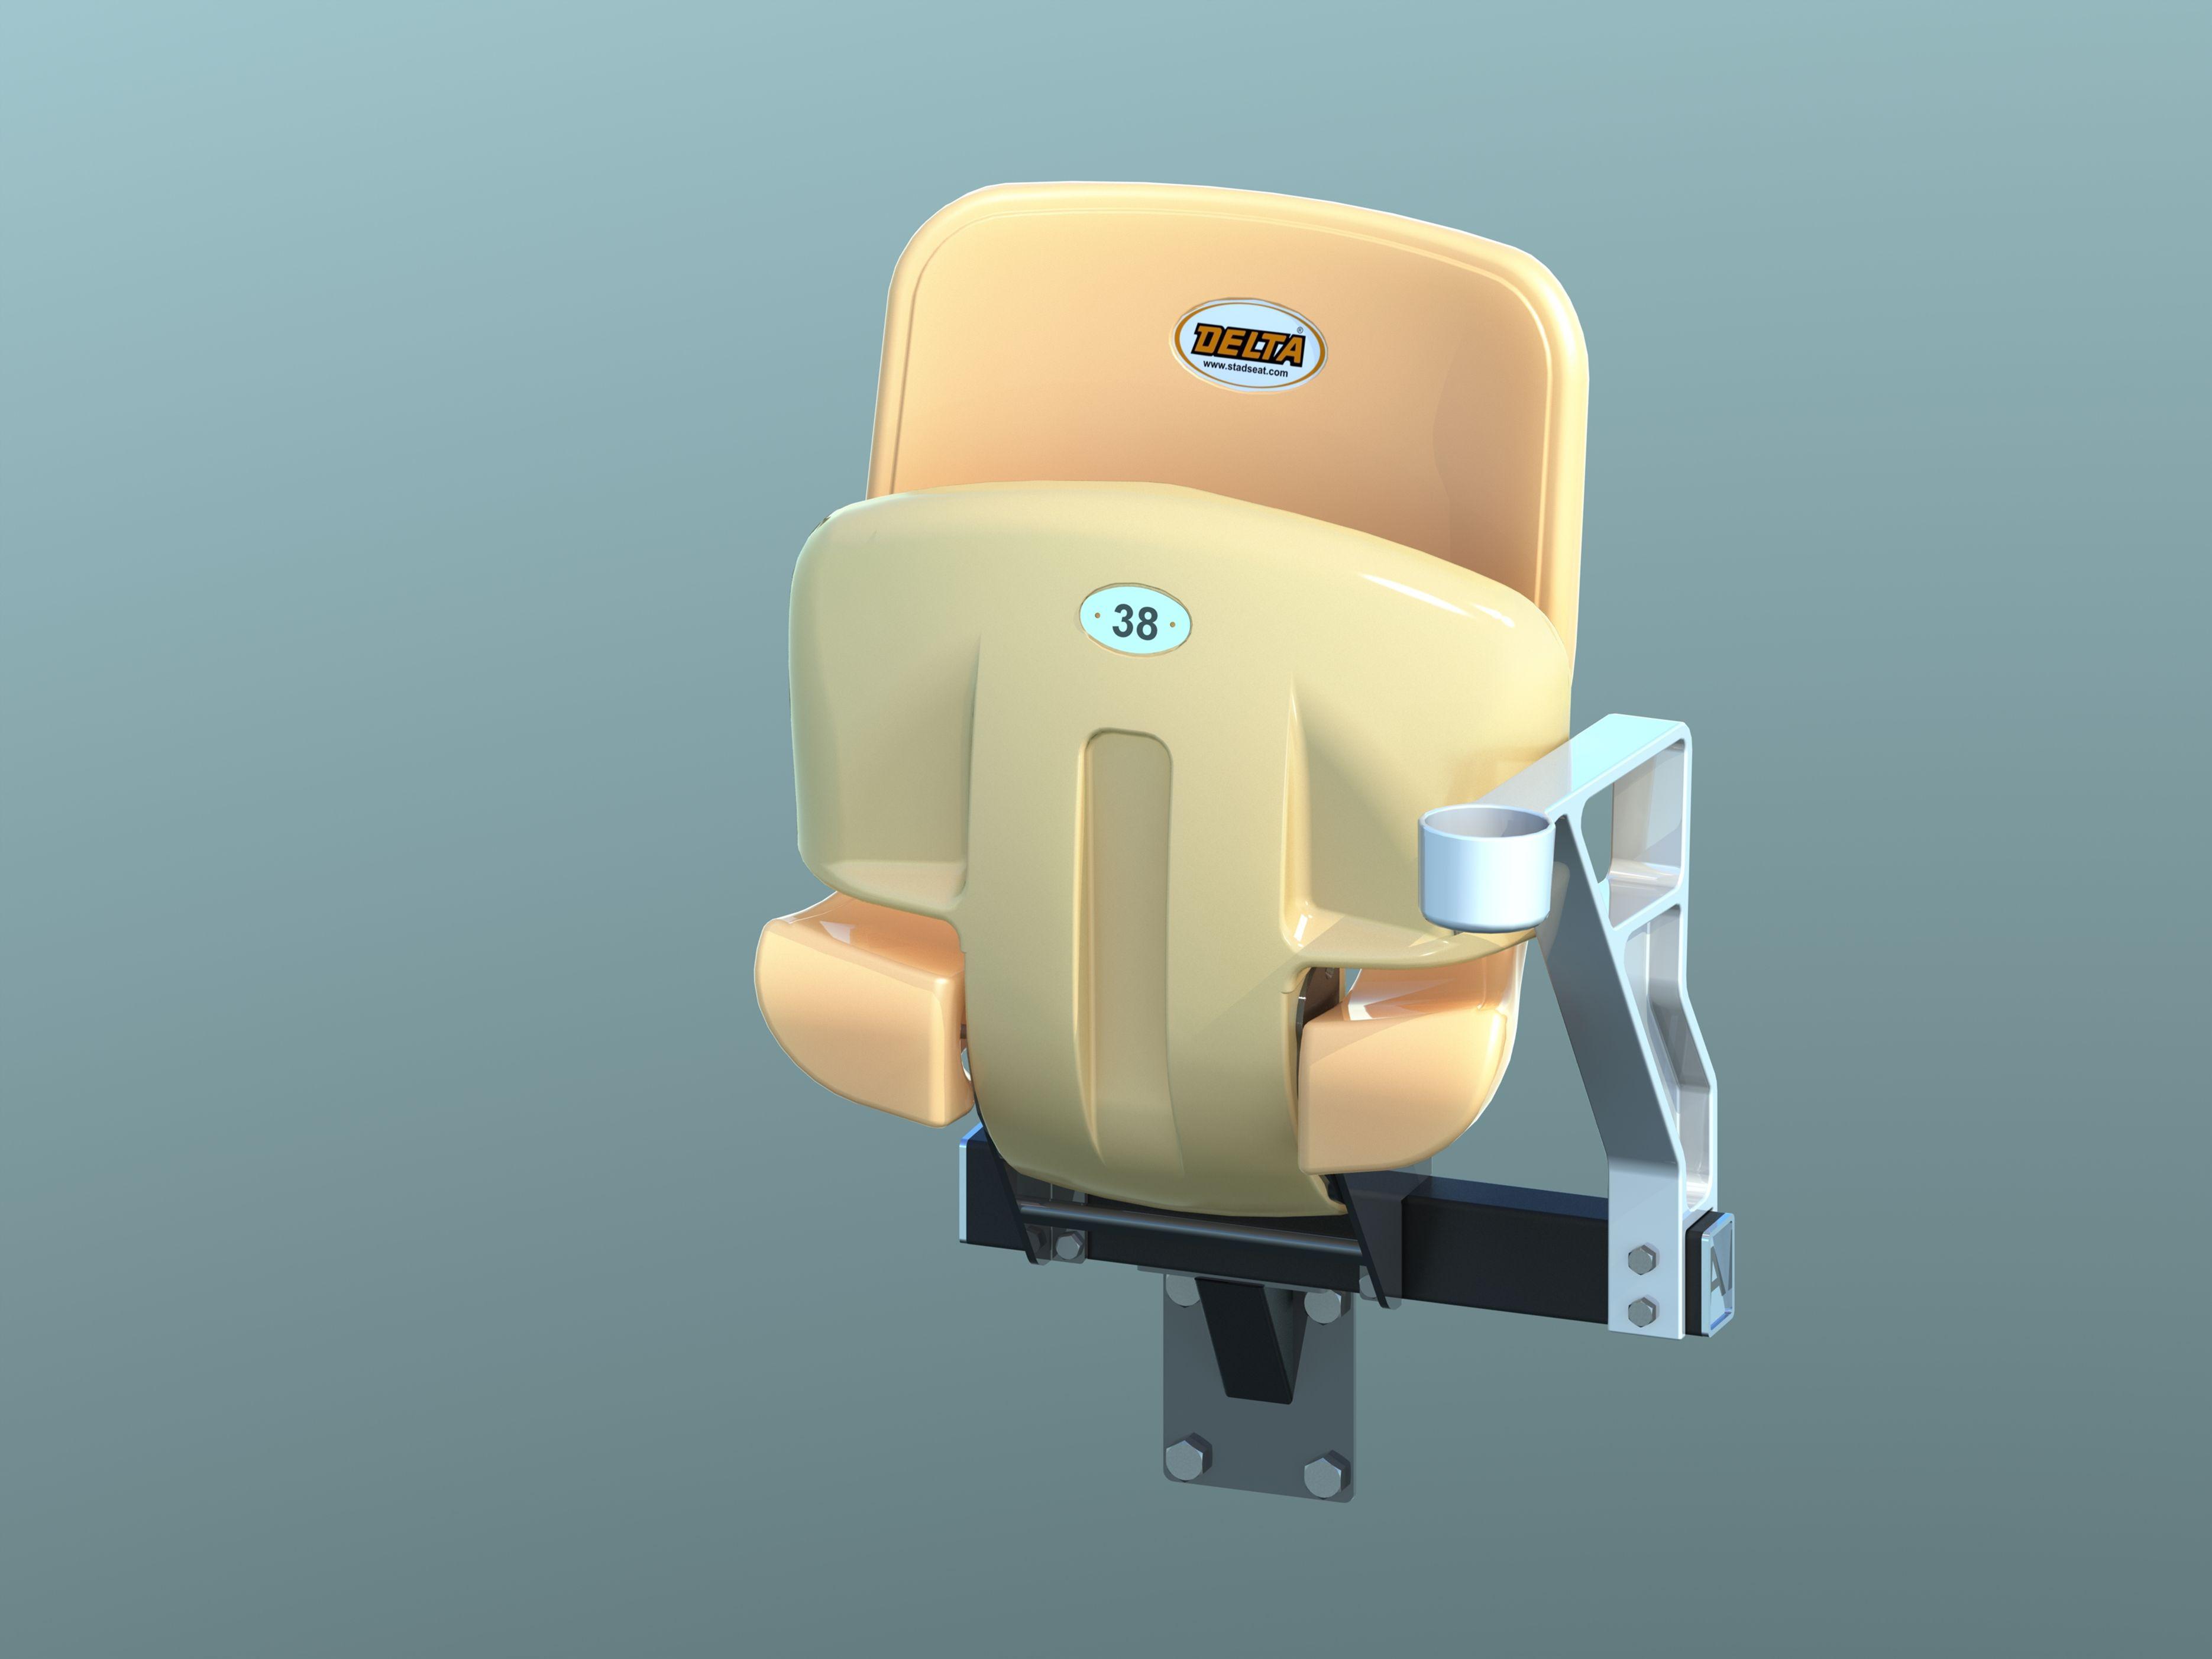 linea_backrest_monoblock_copolymer_pp_stadium_chair_seatorium_08